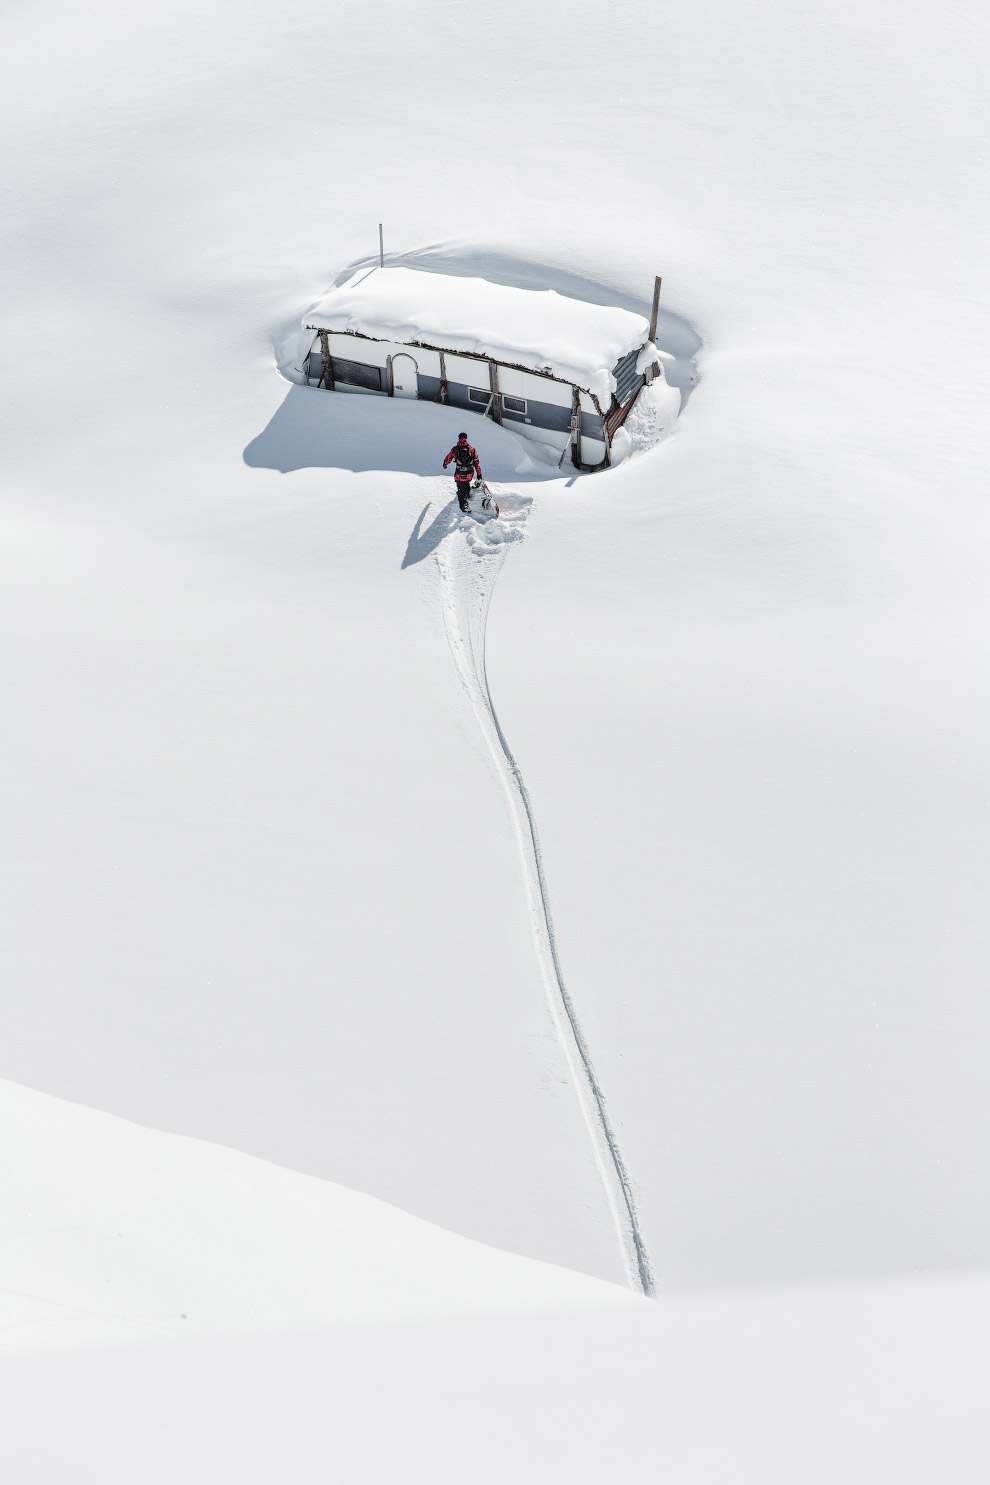 12. Финалист в категории «Образ жизни». Эдмонтон, Канада. (Фото Kirsten Quist | Red Bull Illume